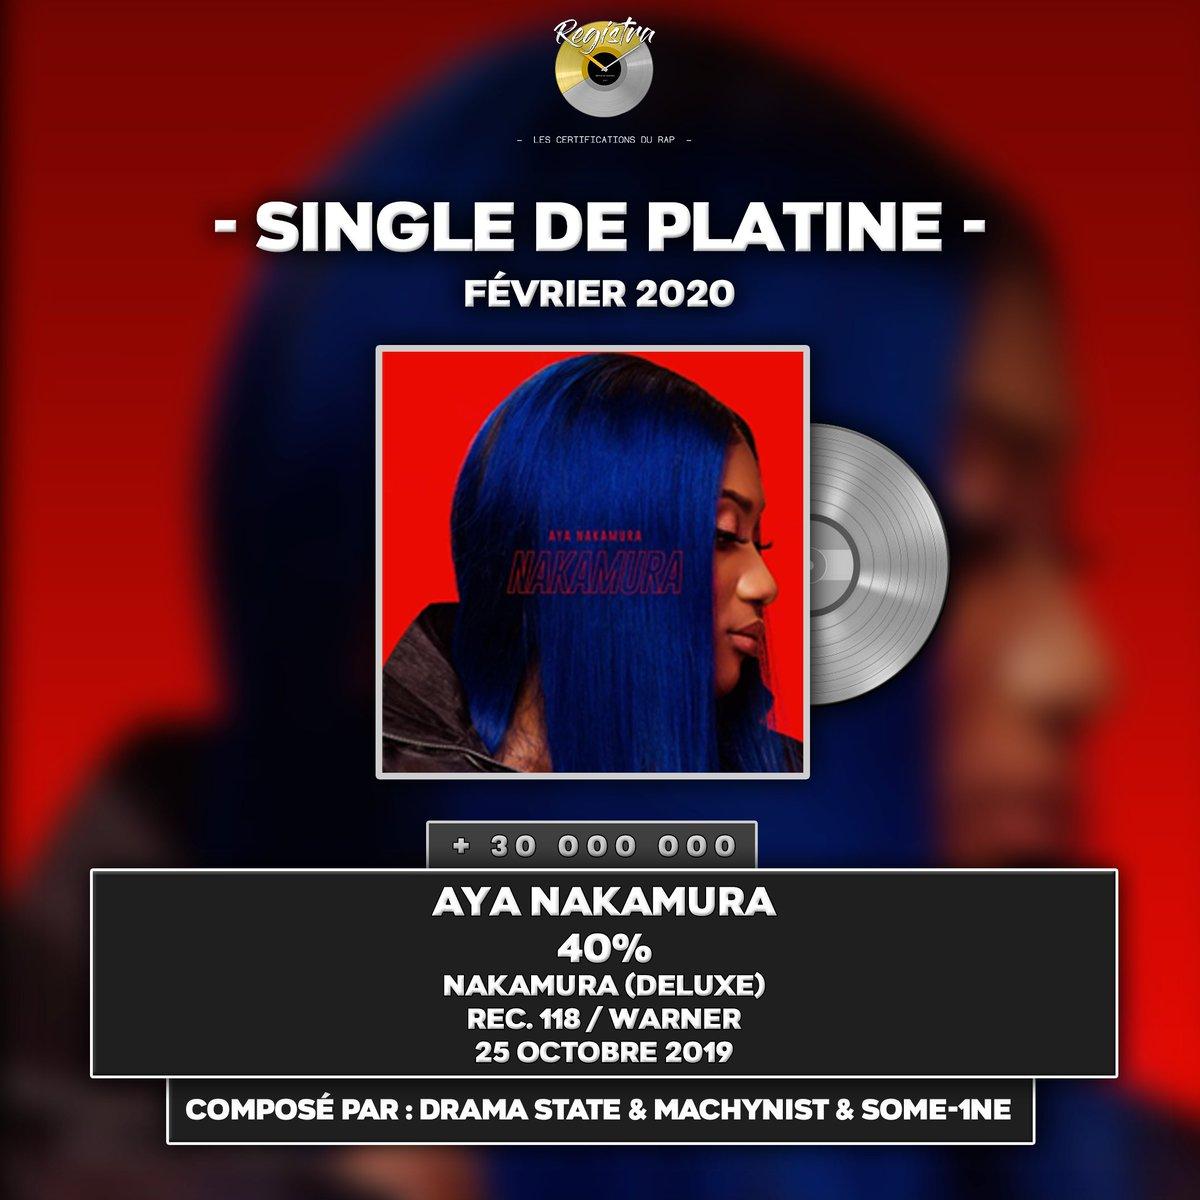 › SINGLE DE PLATINE (+30 000 000 ÉQUIVALENTS VENTES) : FÉVRIER 2020 :  ↪ AYA NAKAMURA ➠ 40% ➠ NAKAMURA (DEUXE) ➠ REC. 118 / WARNER ➠ 25 OCTOBRE 2019  COMPOSÉ PAR : @dramastateprod & @MACHYNIST & @some_1ne  Félicitations à @AyaNakamuraa ! https://t.co/DCq7Bt8KlE